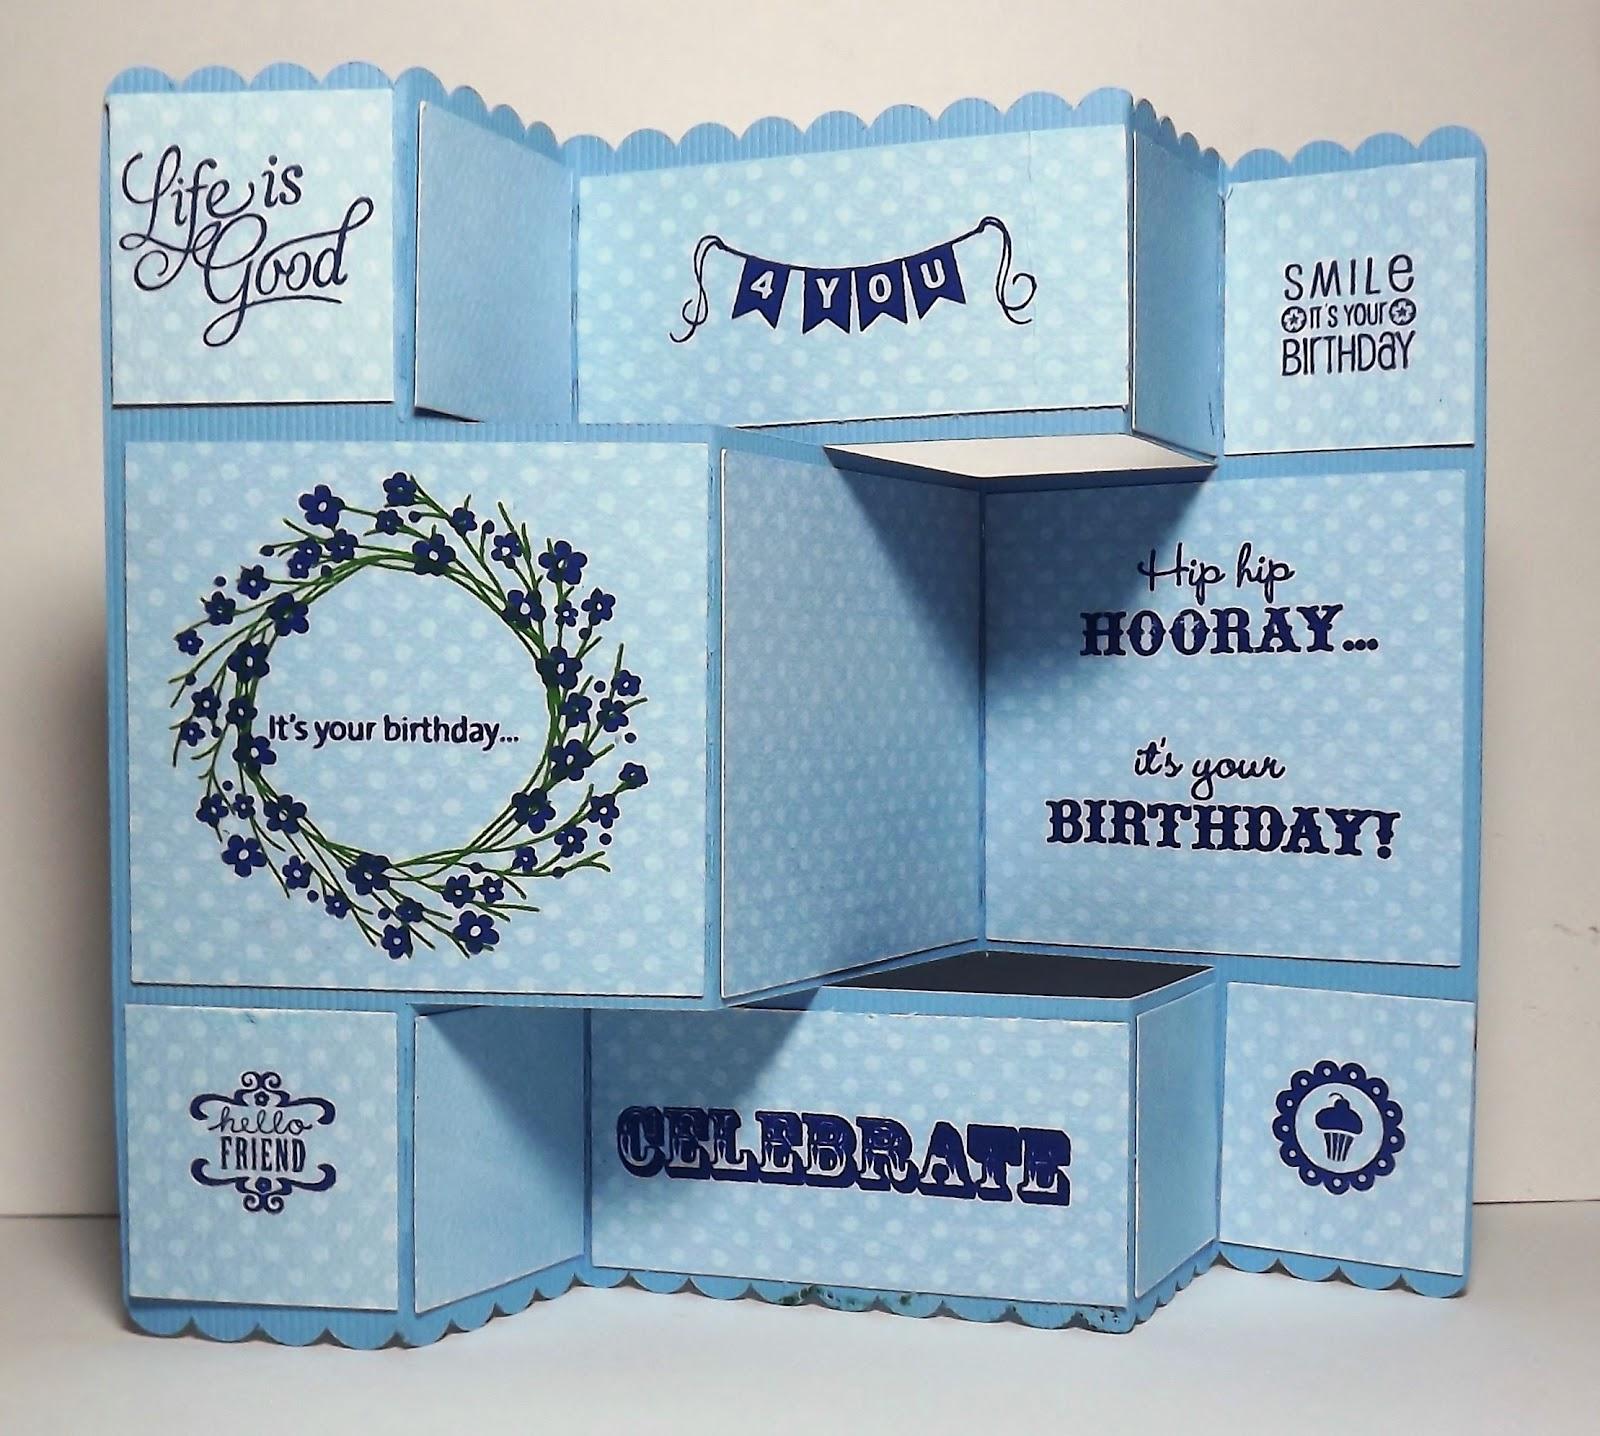 Busy with the Cricky: Tri-fold Birthday Card